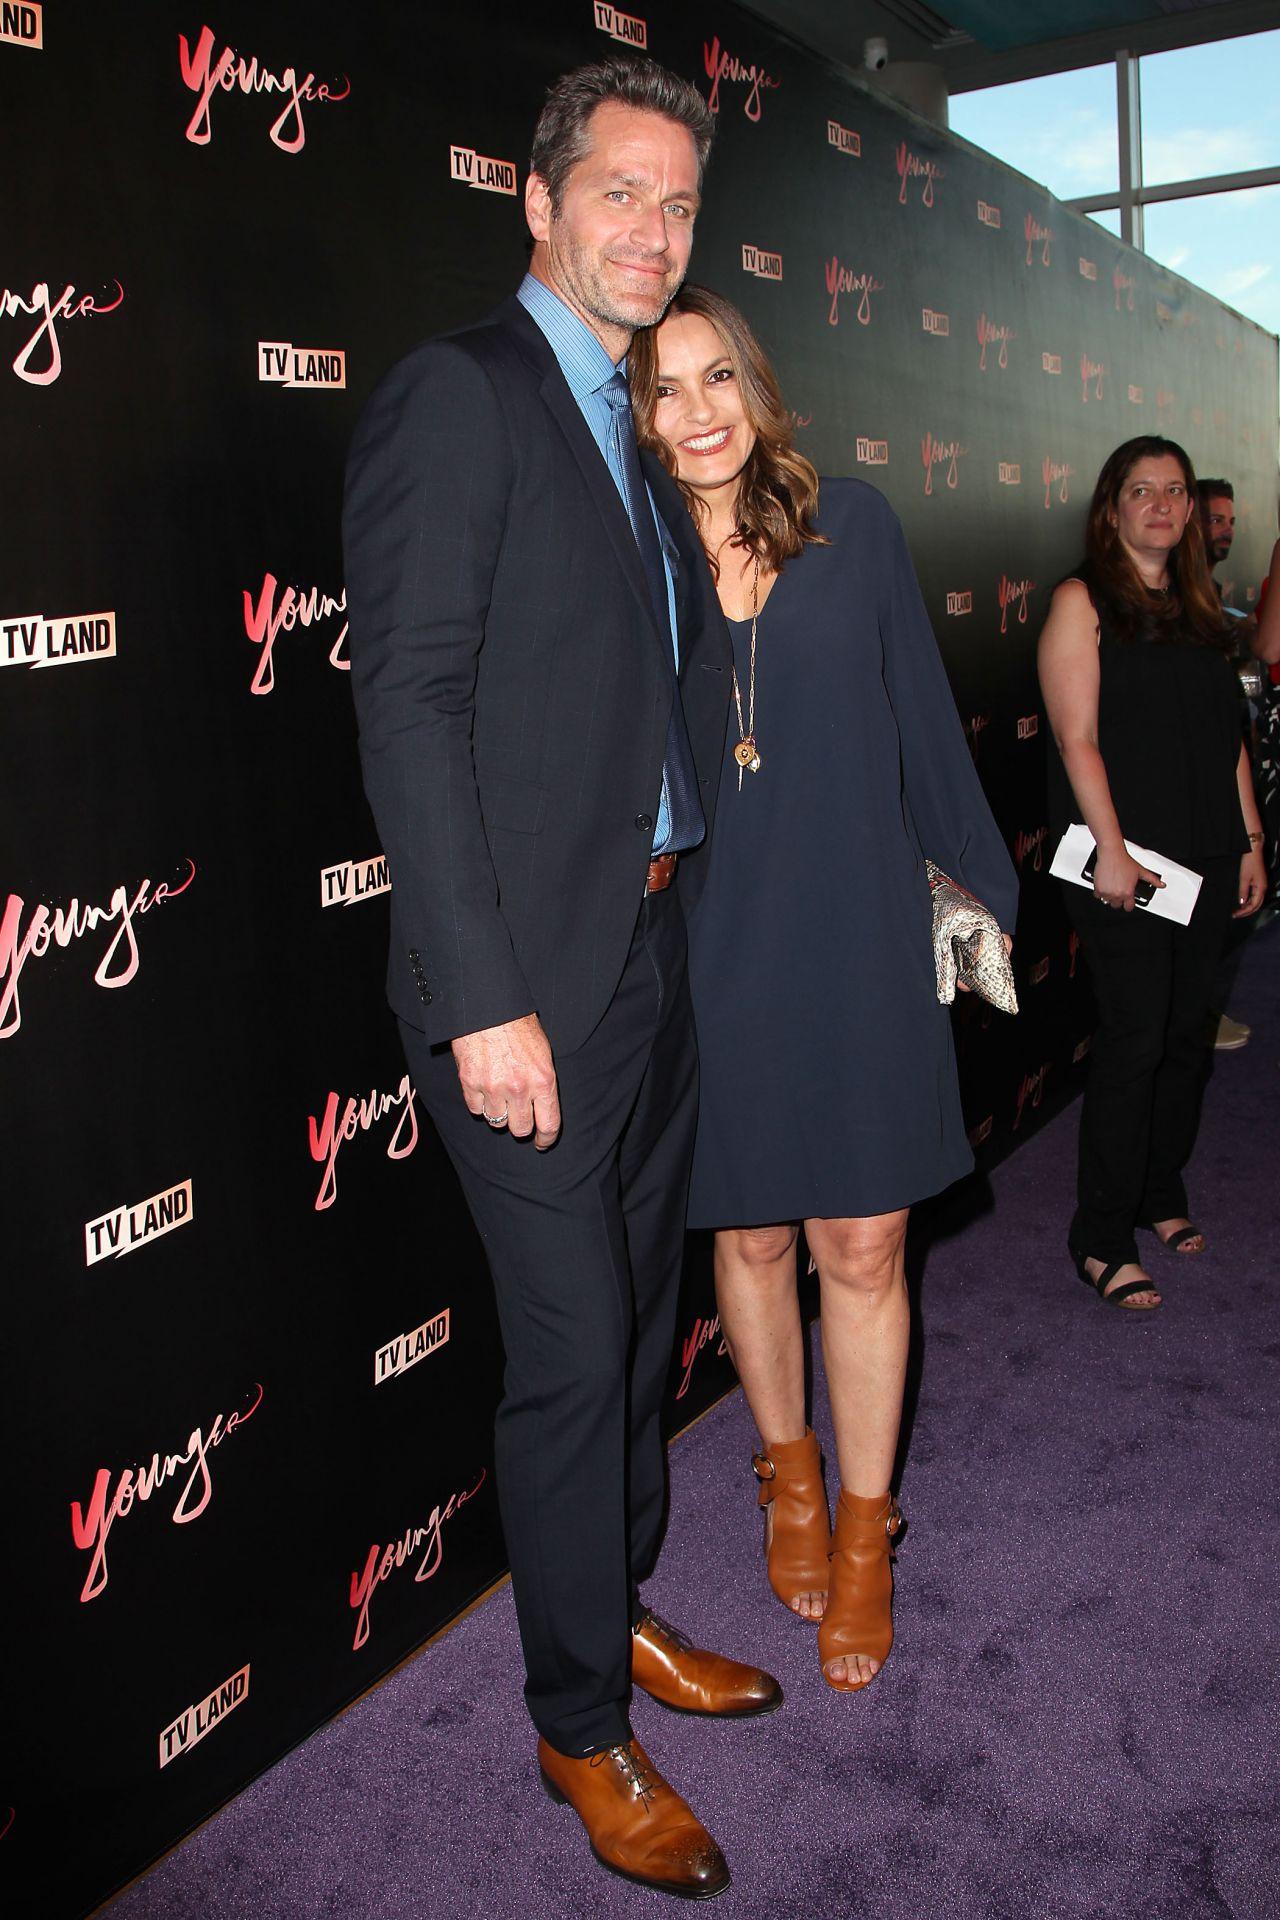 Mariska hargitay younger season 4 premiere in new york nude (23 photos), Cleavage Celebrity pics